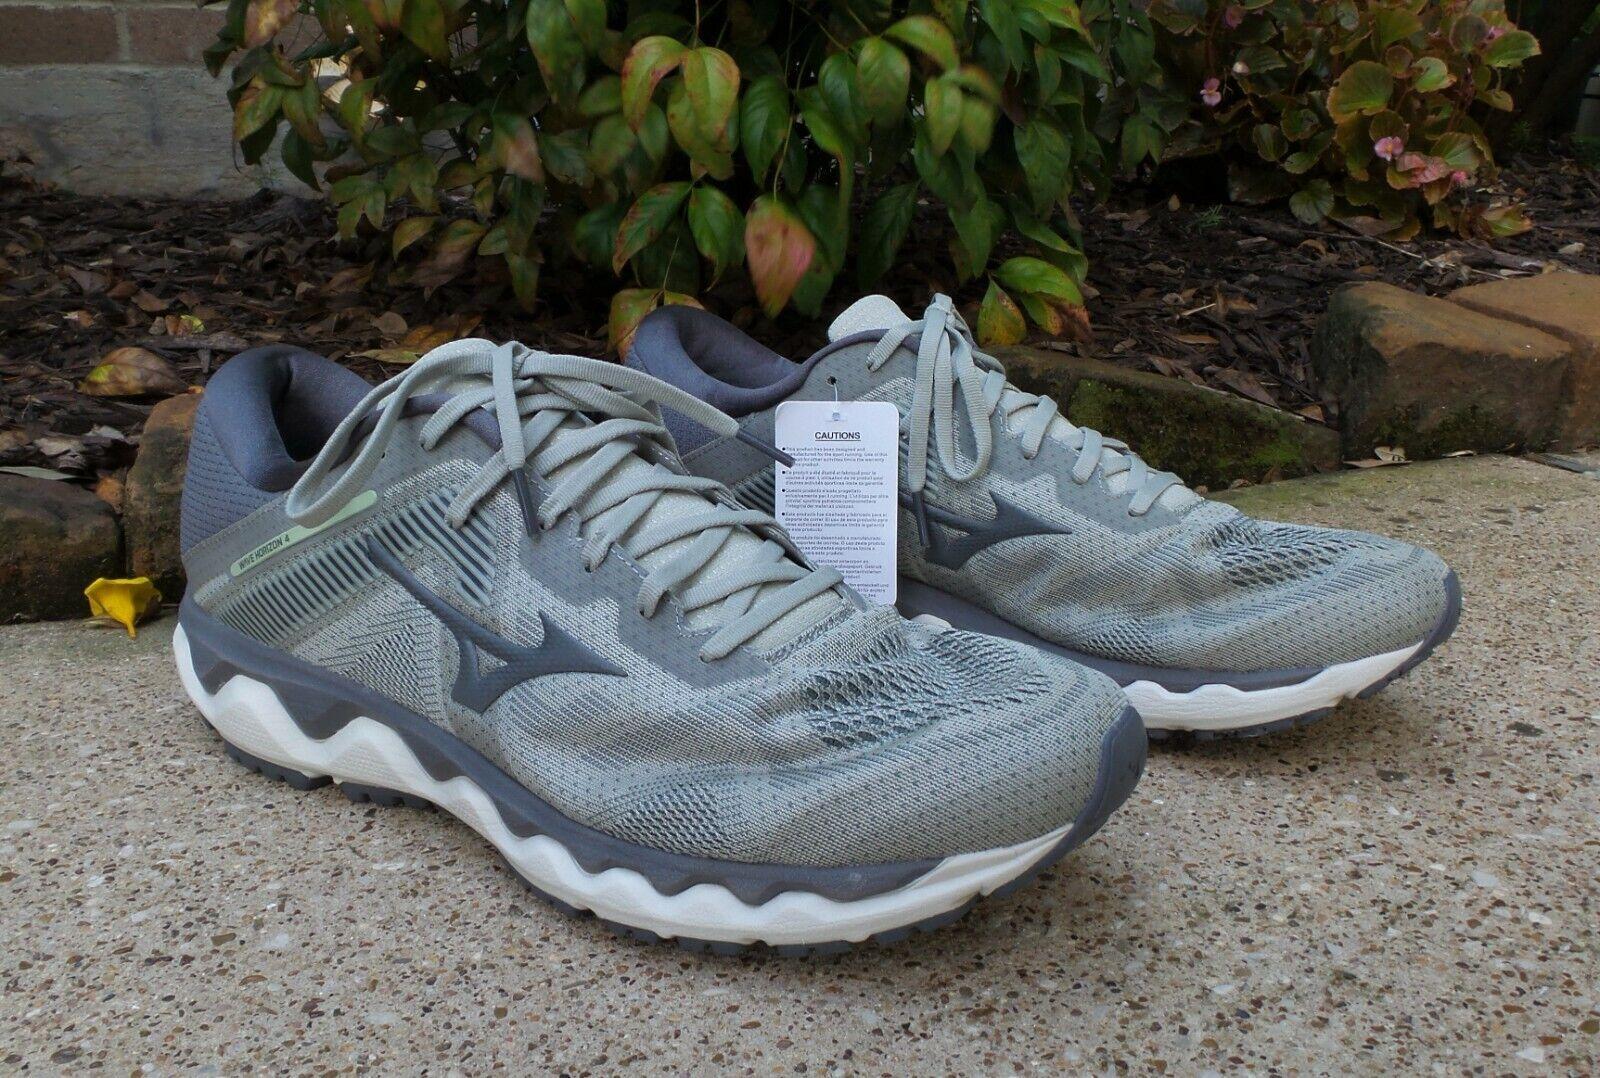 Men's Mizuno Wave Horizon 4 Grey Lace Up Running Shoes Size 14 NEW